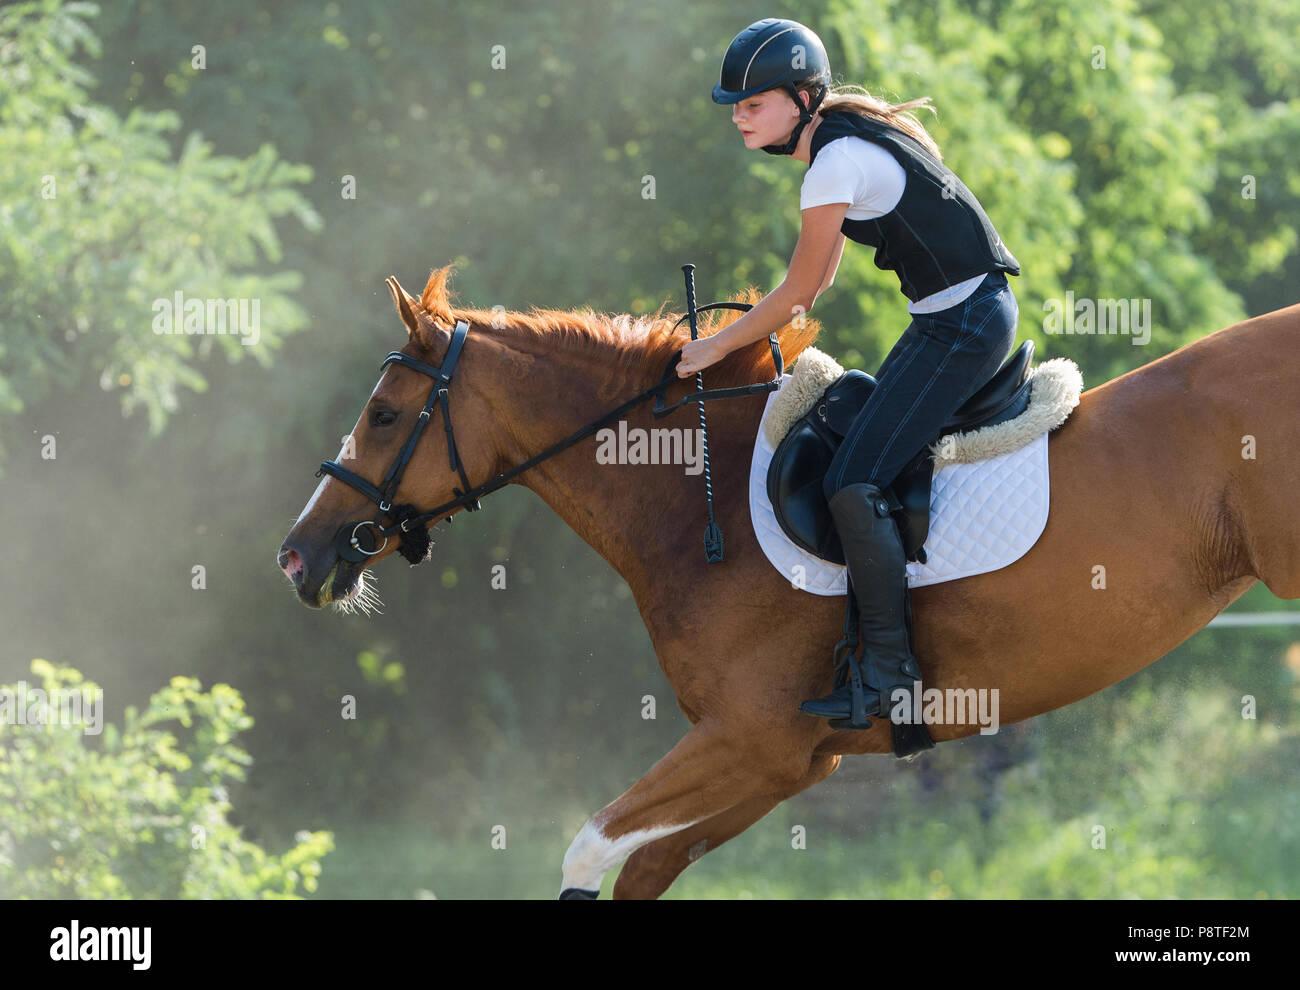 Young Girl riding a horse Photo Stock